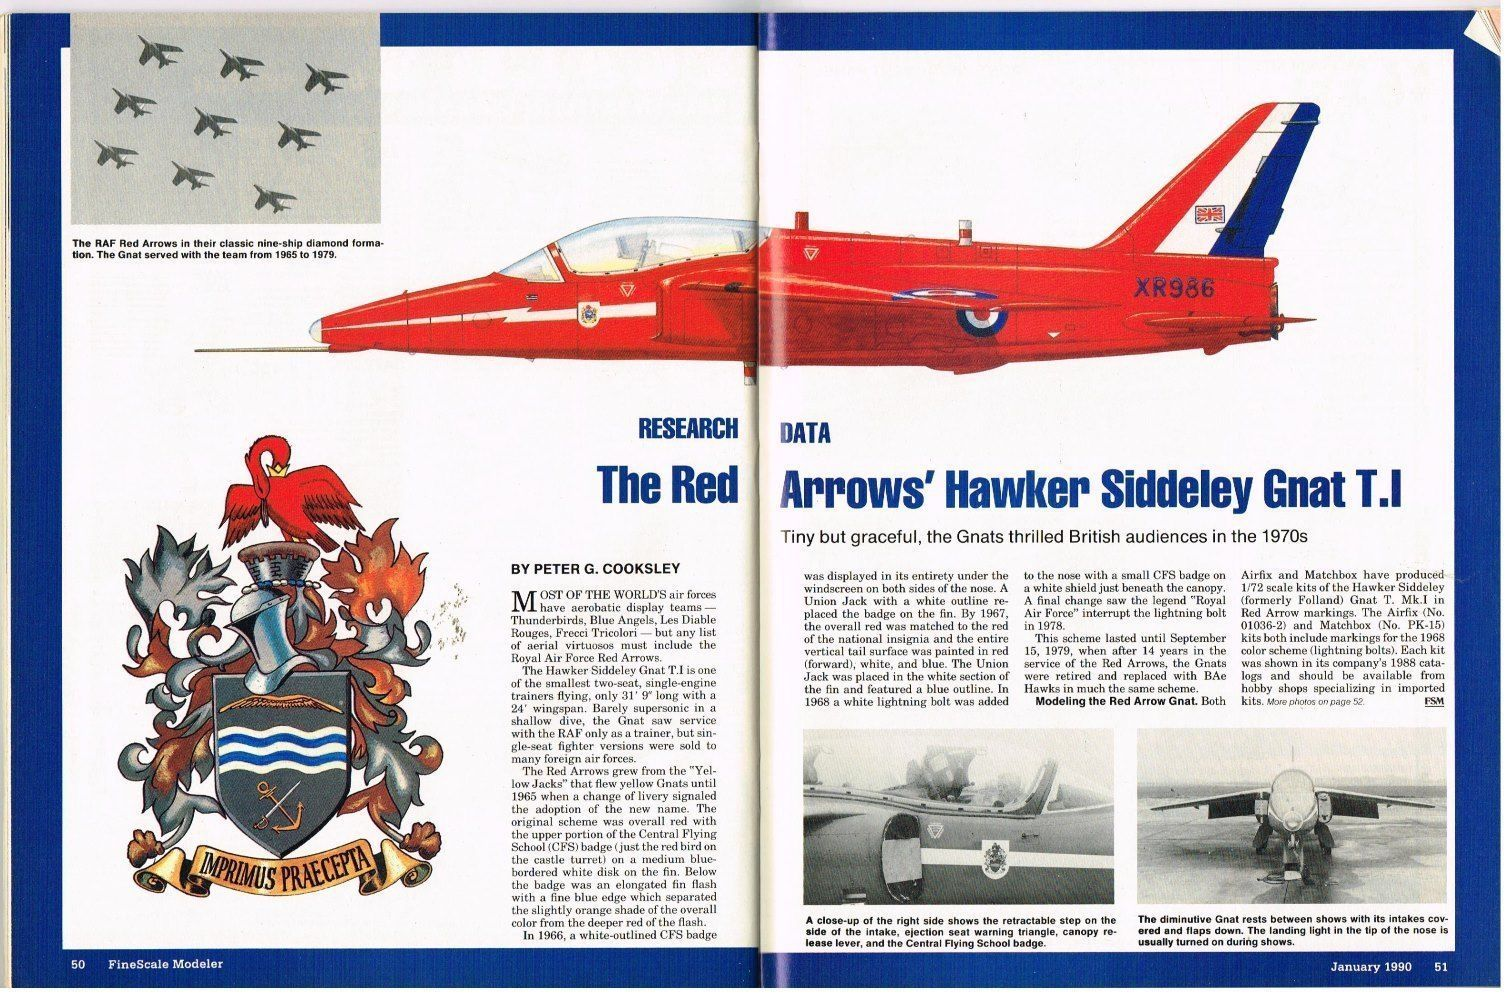 FINE SCALE MODELER Magazine January 1990 Red Arrows Hawker Gnat T.1